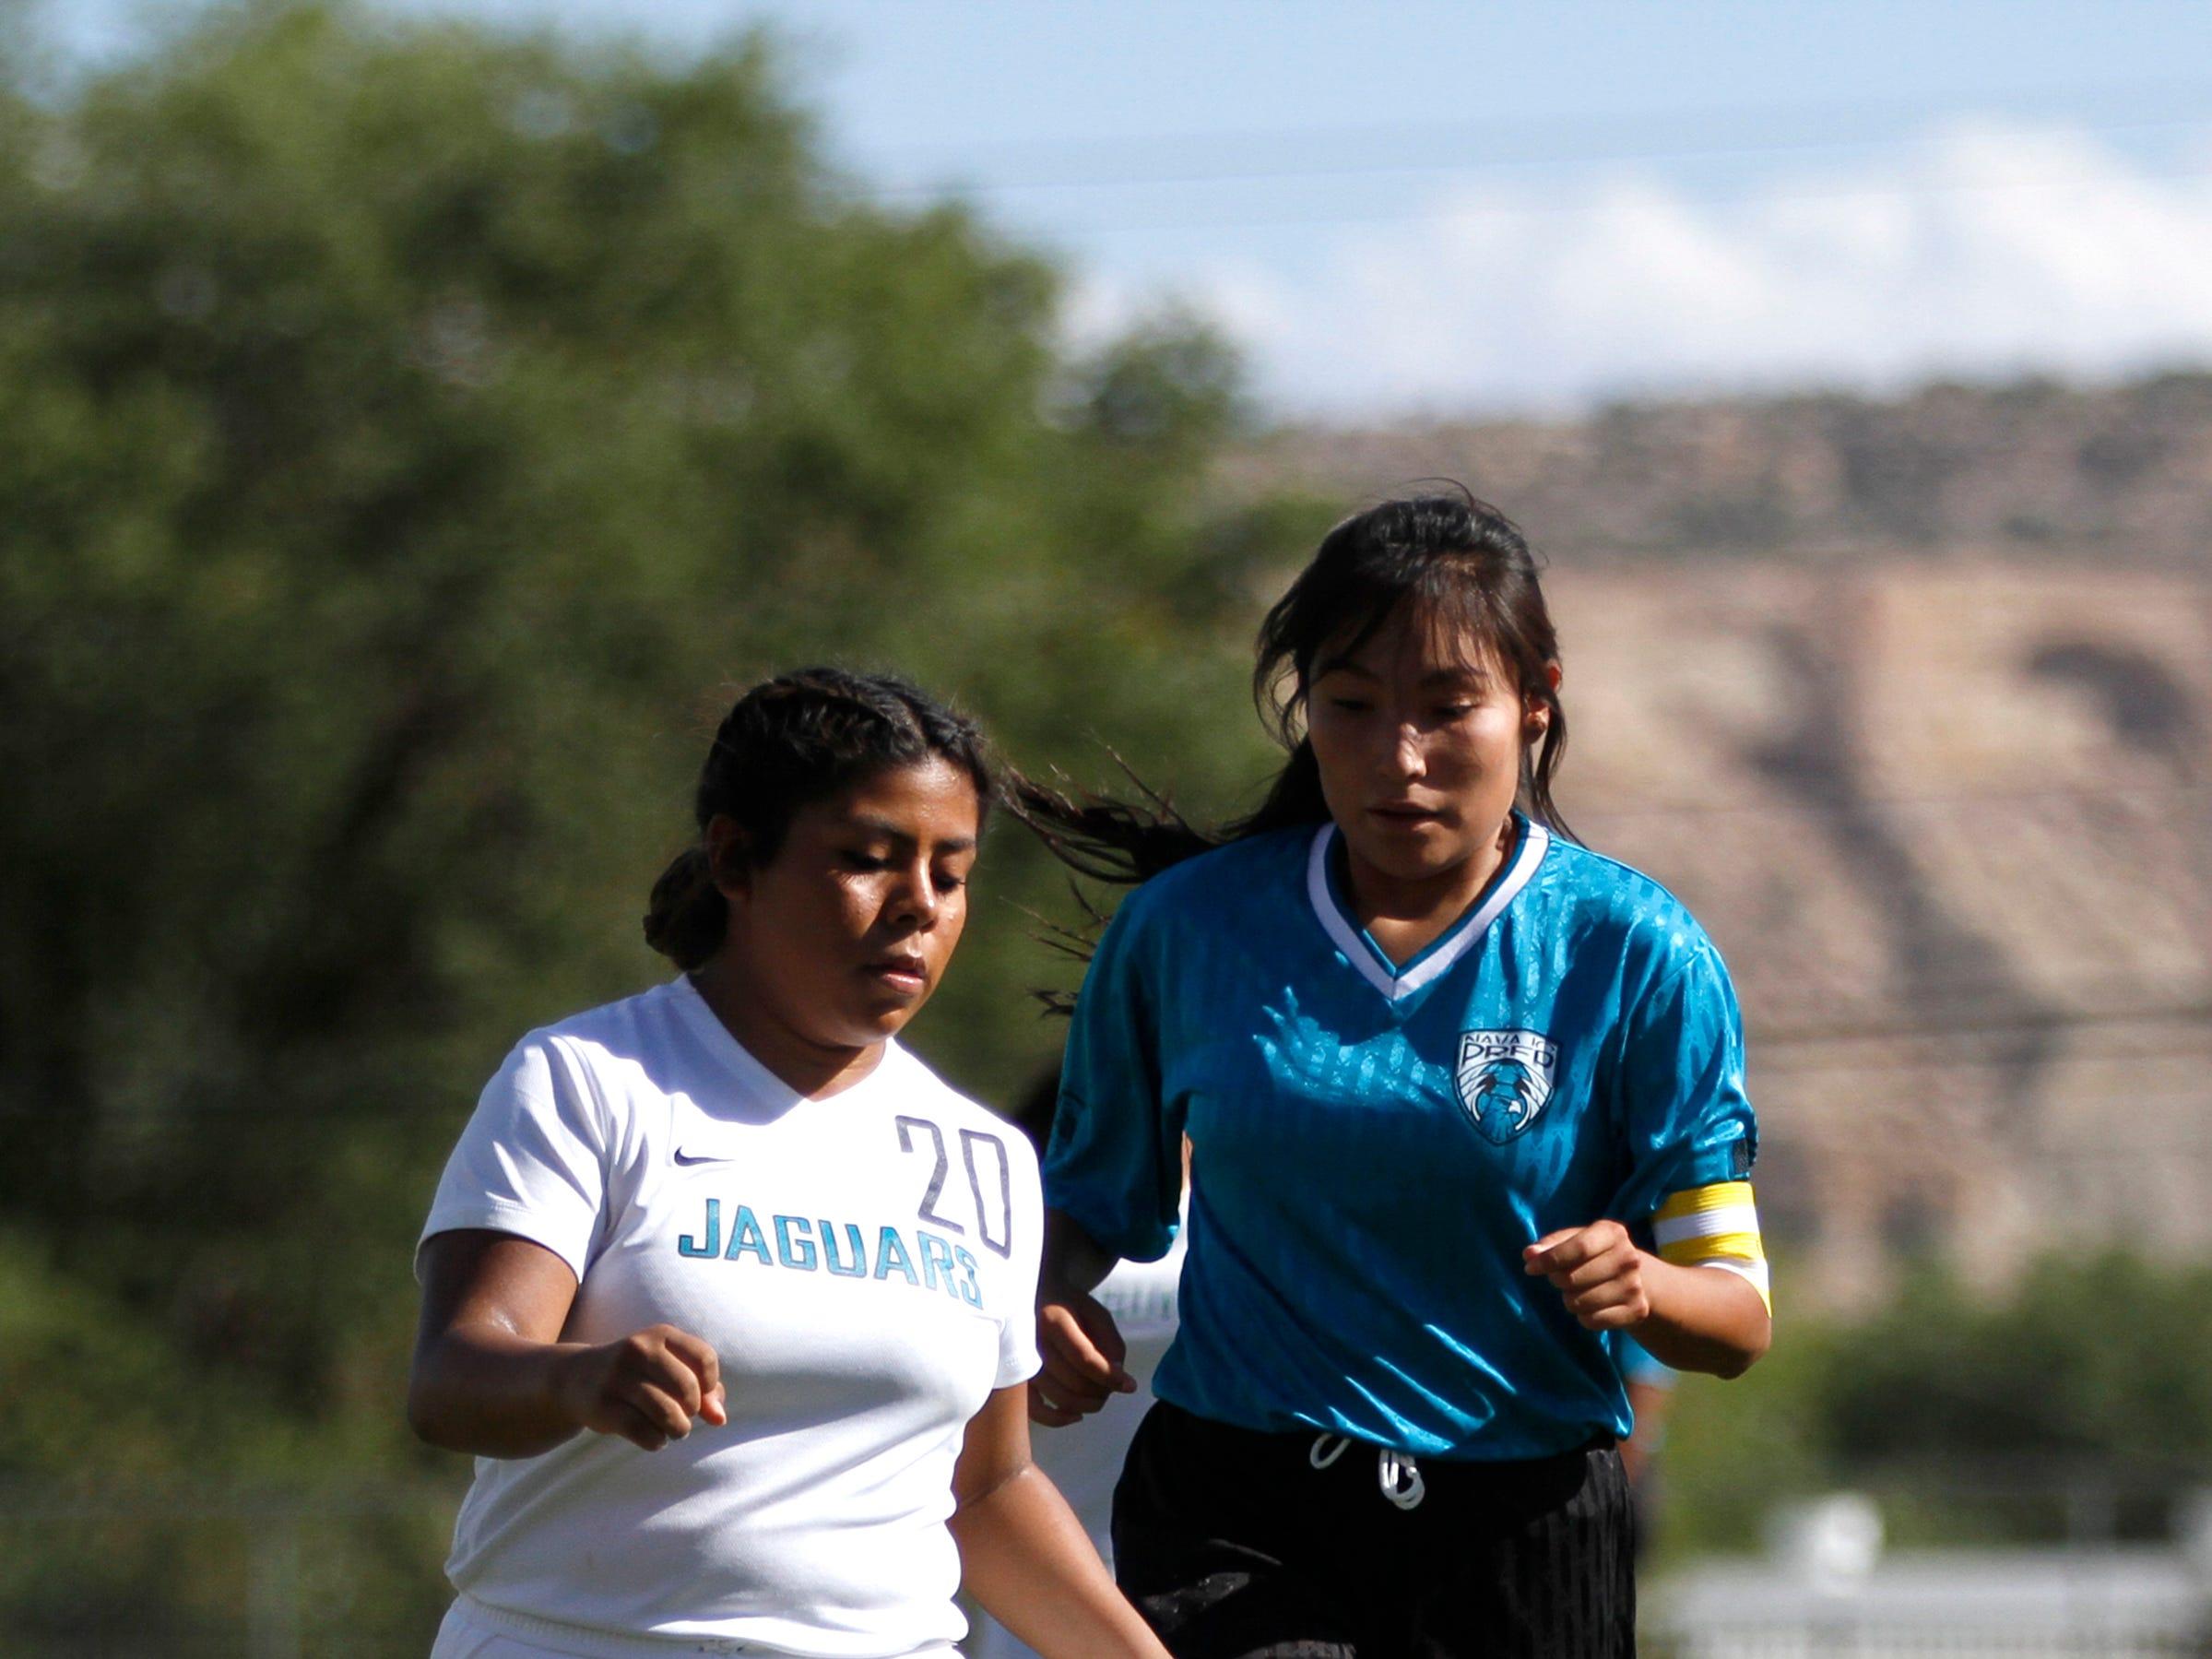 Navajo Prep's Geena Tsosie challenges Capital's Estefani Chali for possession of the ball, Tuesday, Sept. 11, 2018 at Eagle Stadium in Farmington.